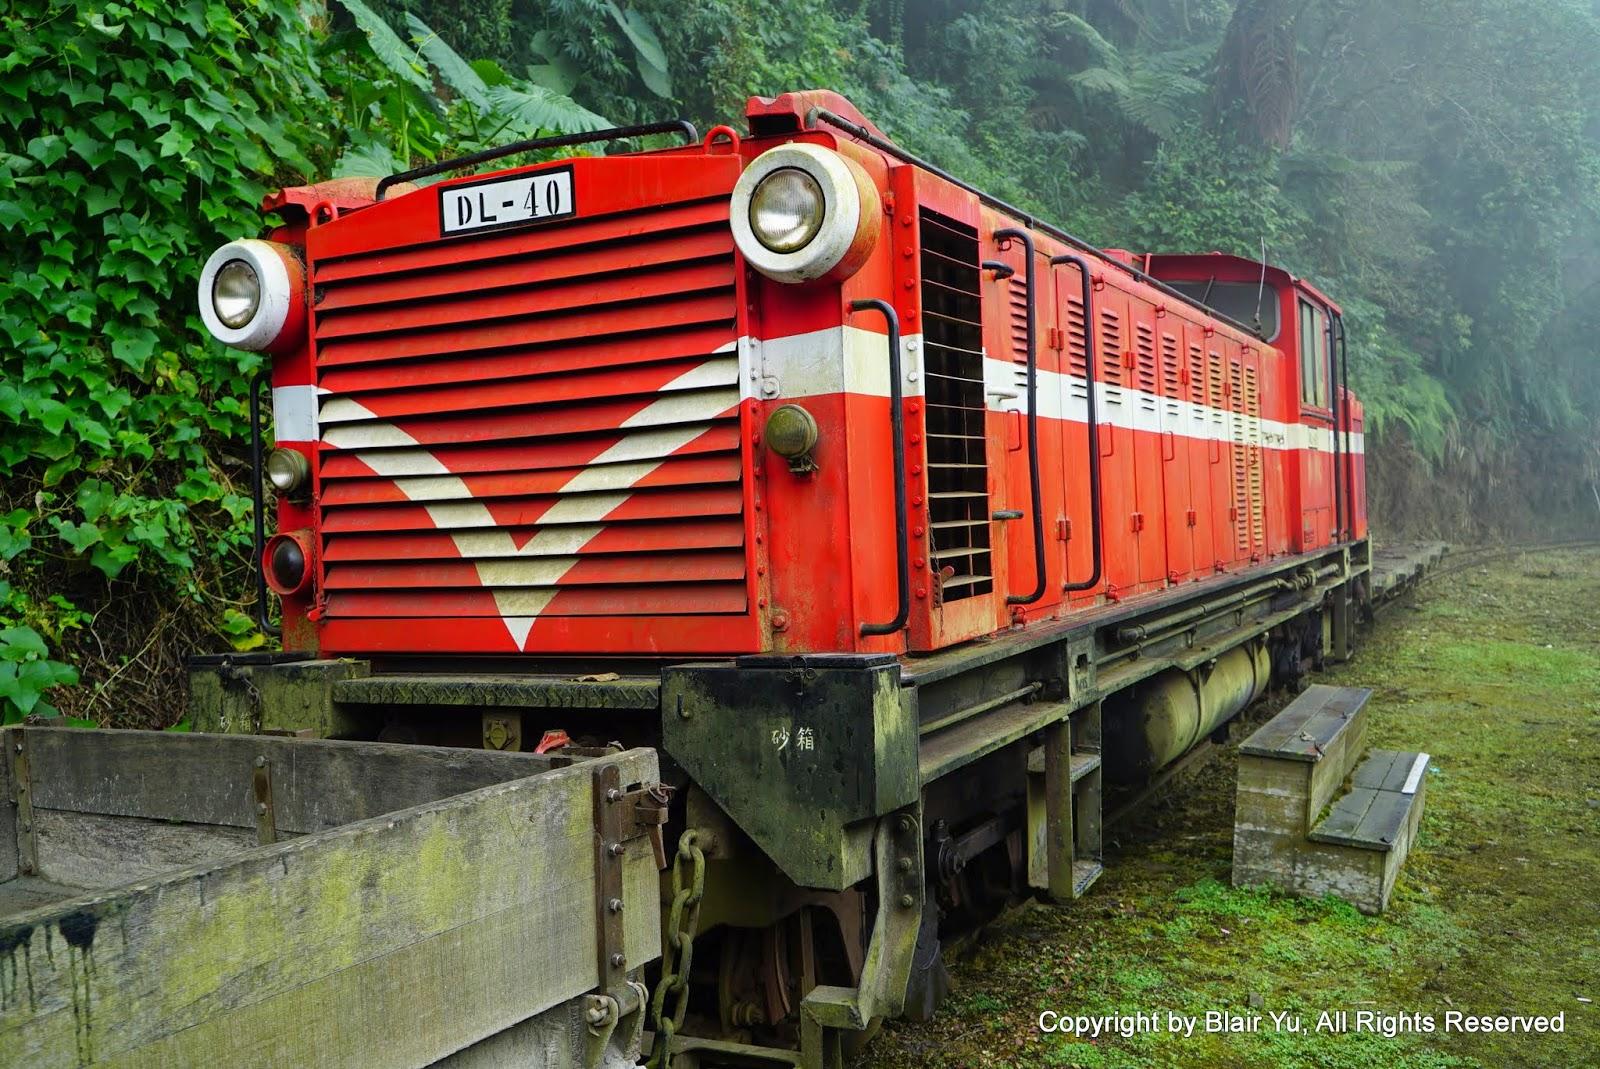 Blair's 鐵道攝影: DL40柴油機車 / Alishan Forest Railway DL40 Diesel Locomotive